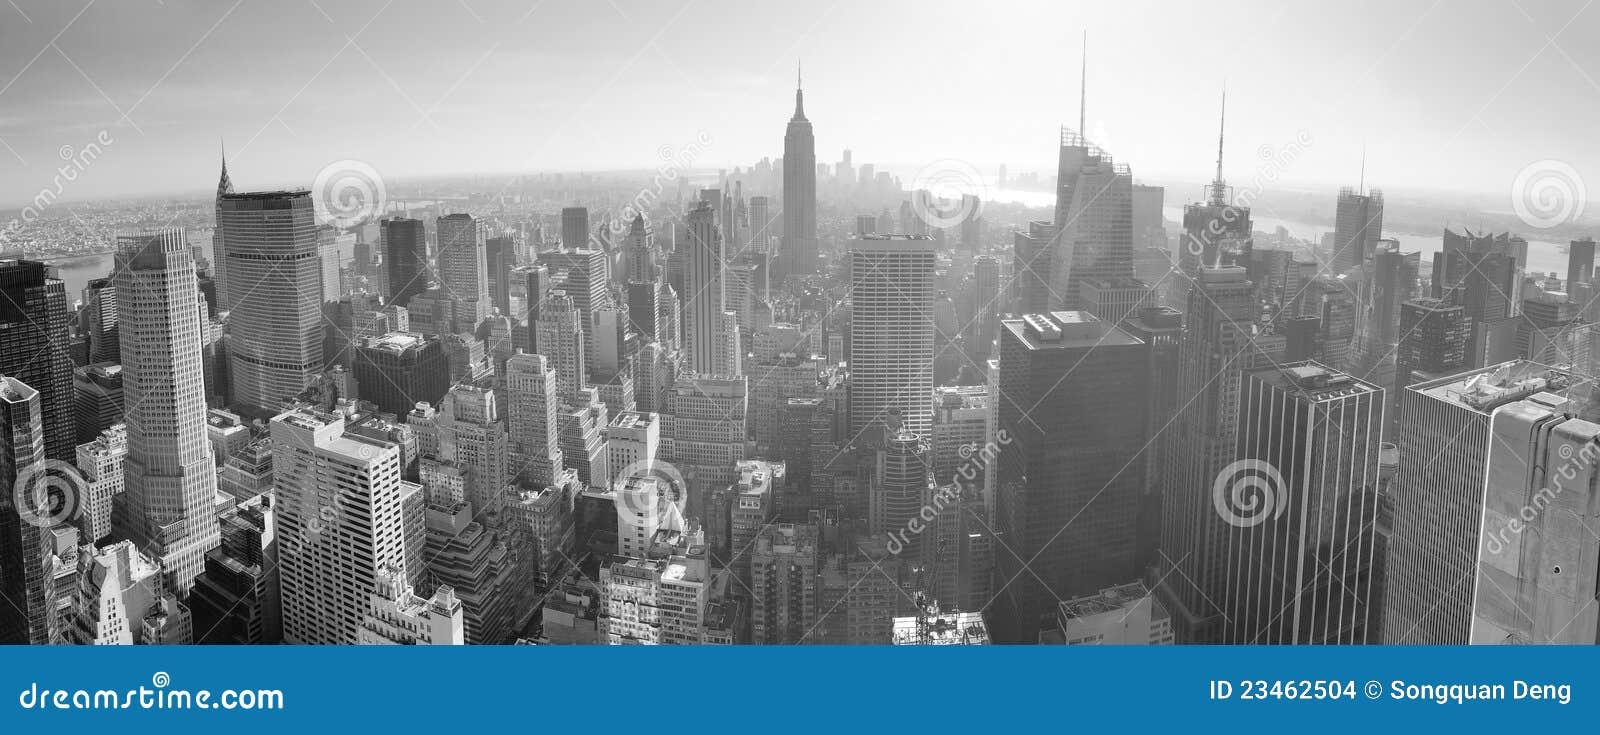 New York City Skyline Black And White Drawing New York City Skyline in Black